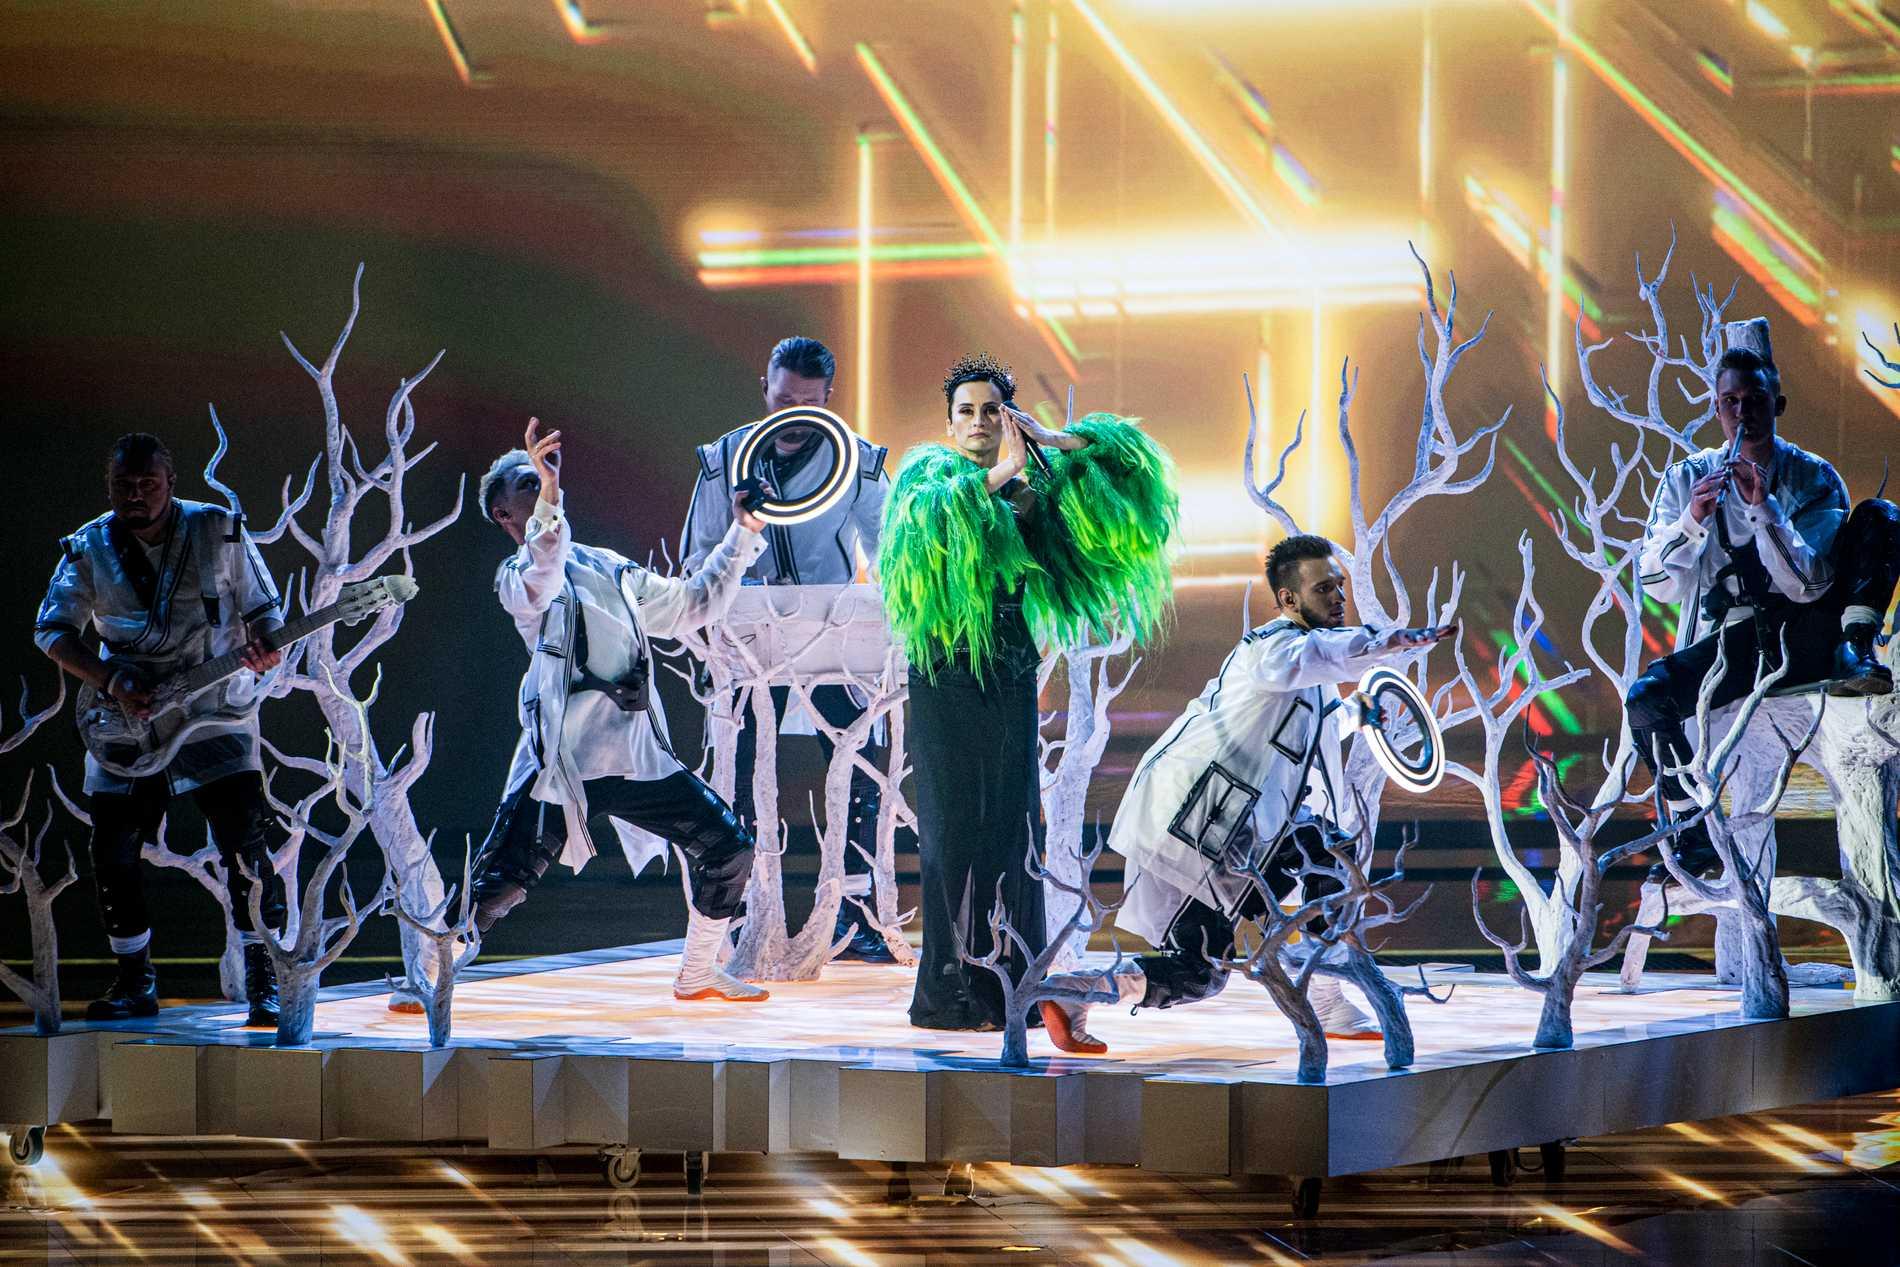 Ukrainas bidrag på scenen under ett genrep.